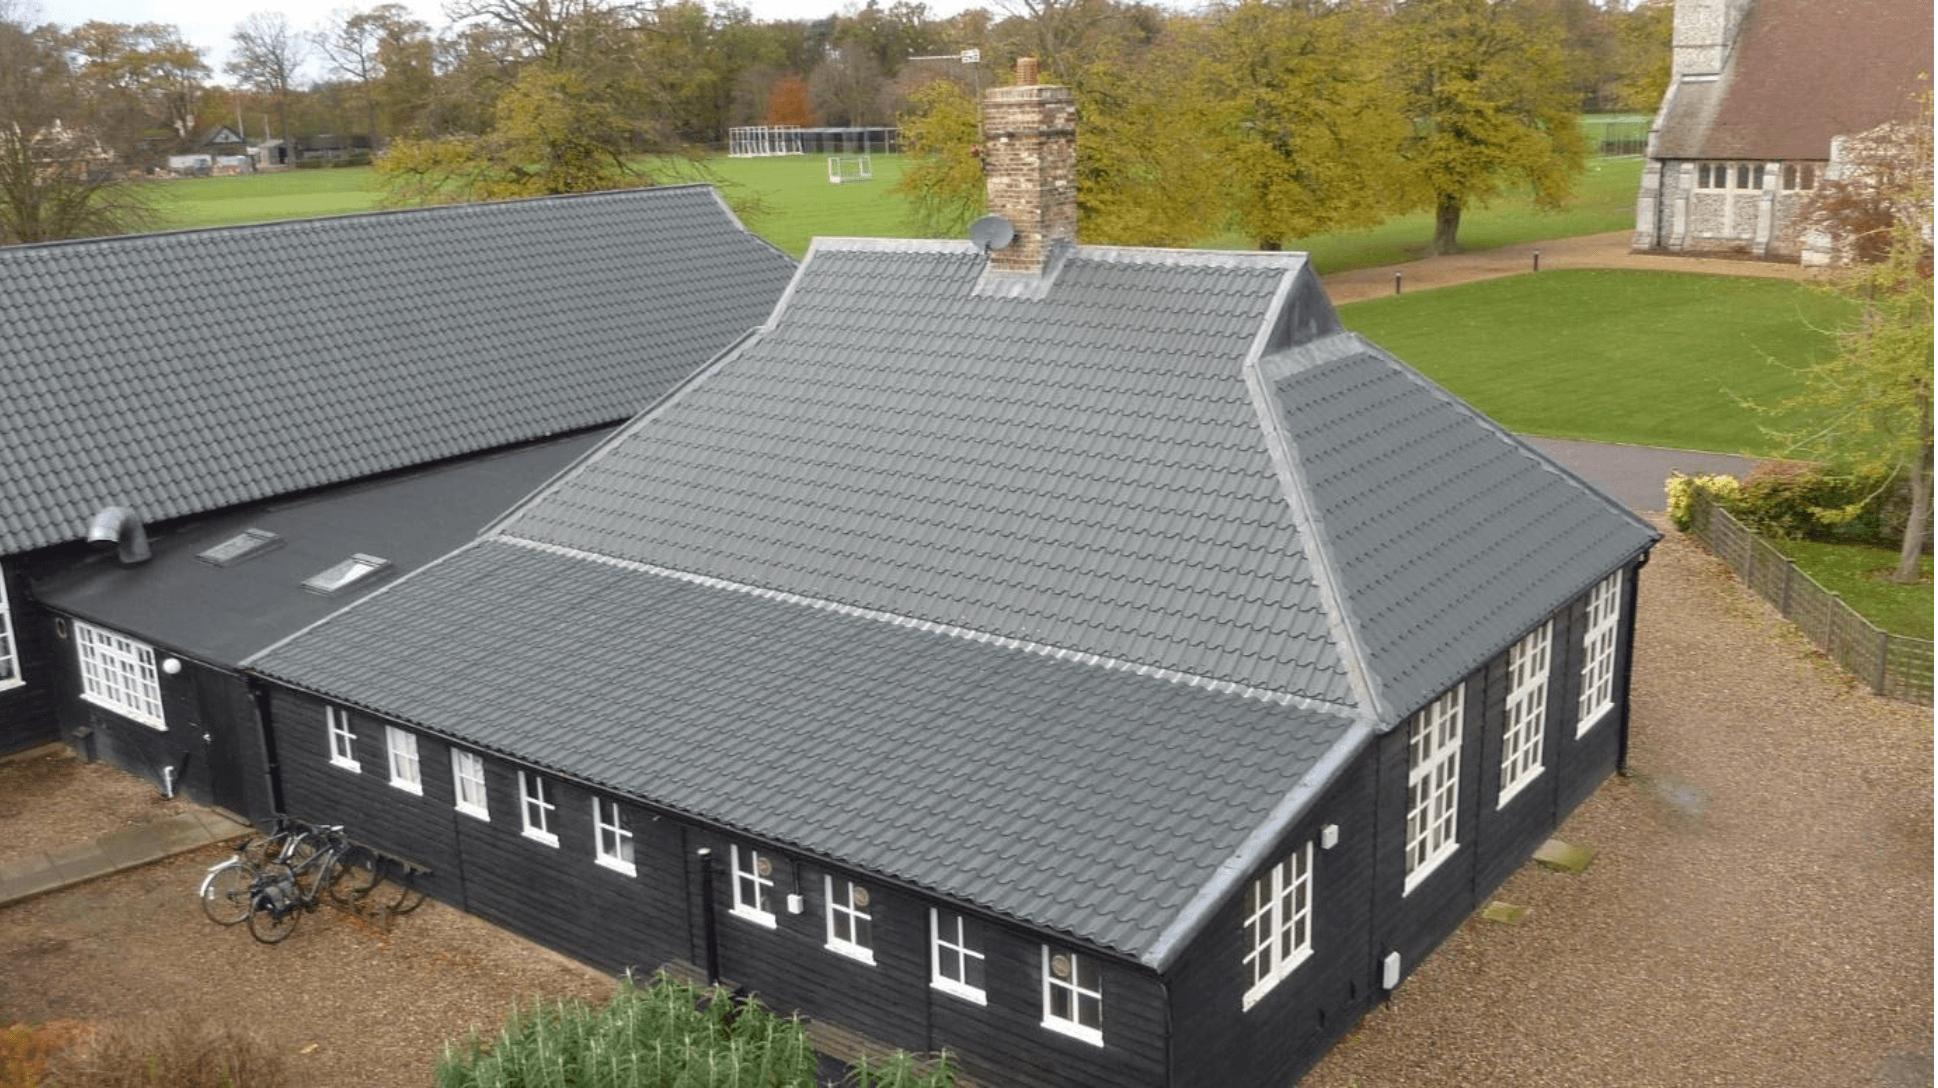 Tileform Roof